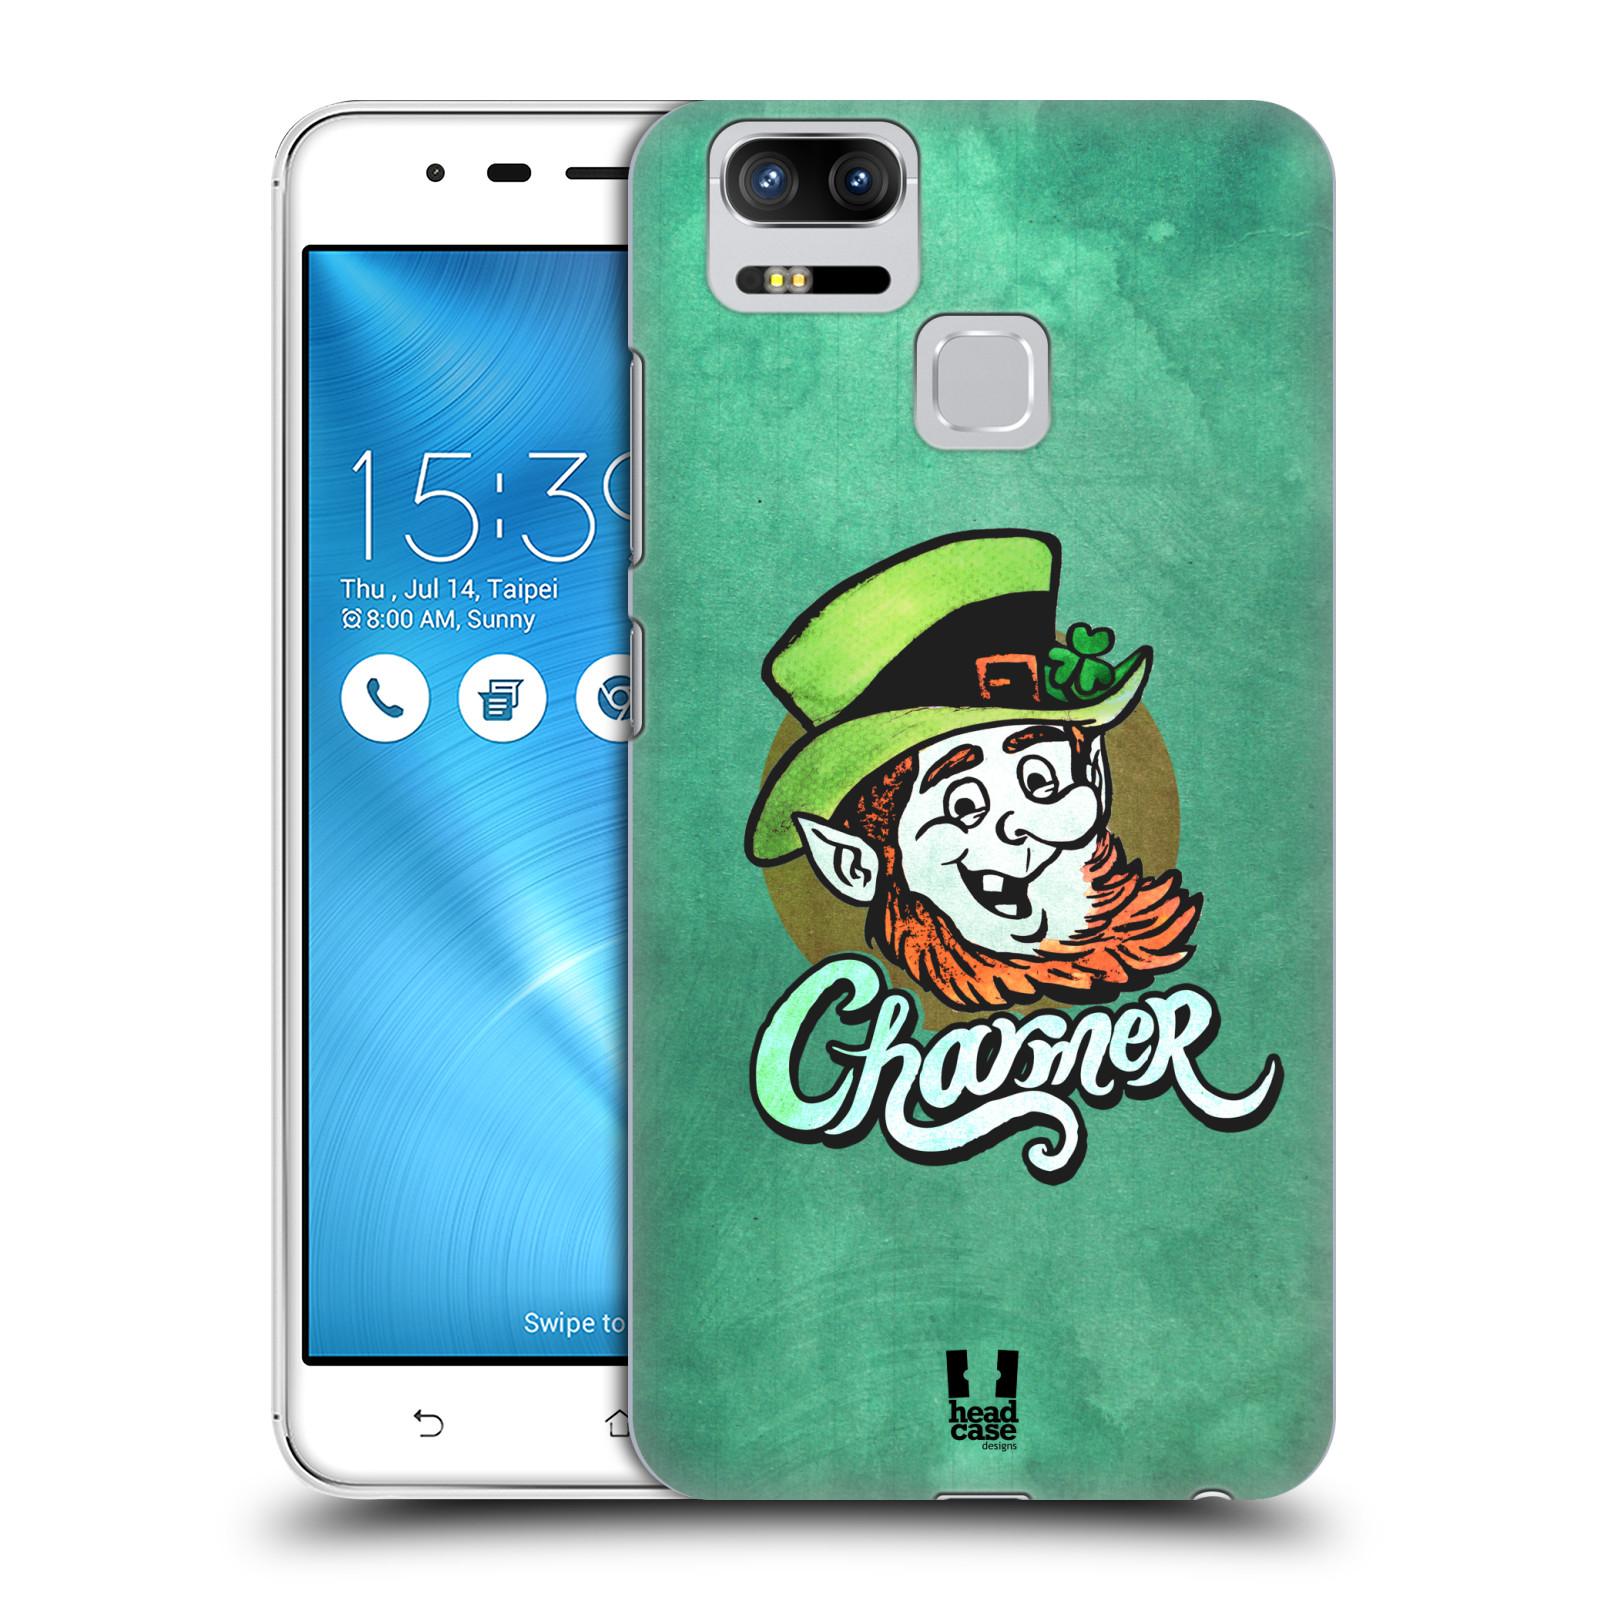 Plastové pouzdro na mobil Asus ZenFone 3 ZOOM ZE553KL - Head Case - CHARMER (Plastový kryt či obal na mobilní telefon Asus ZenFone 3 ZOOM ZE553KL s motivem CHARMER)